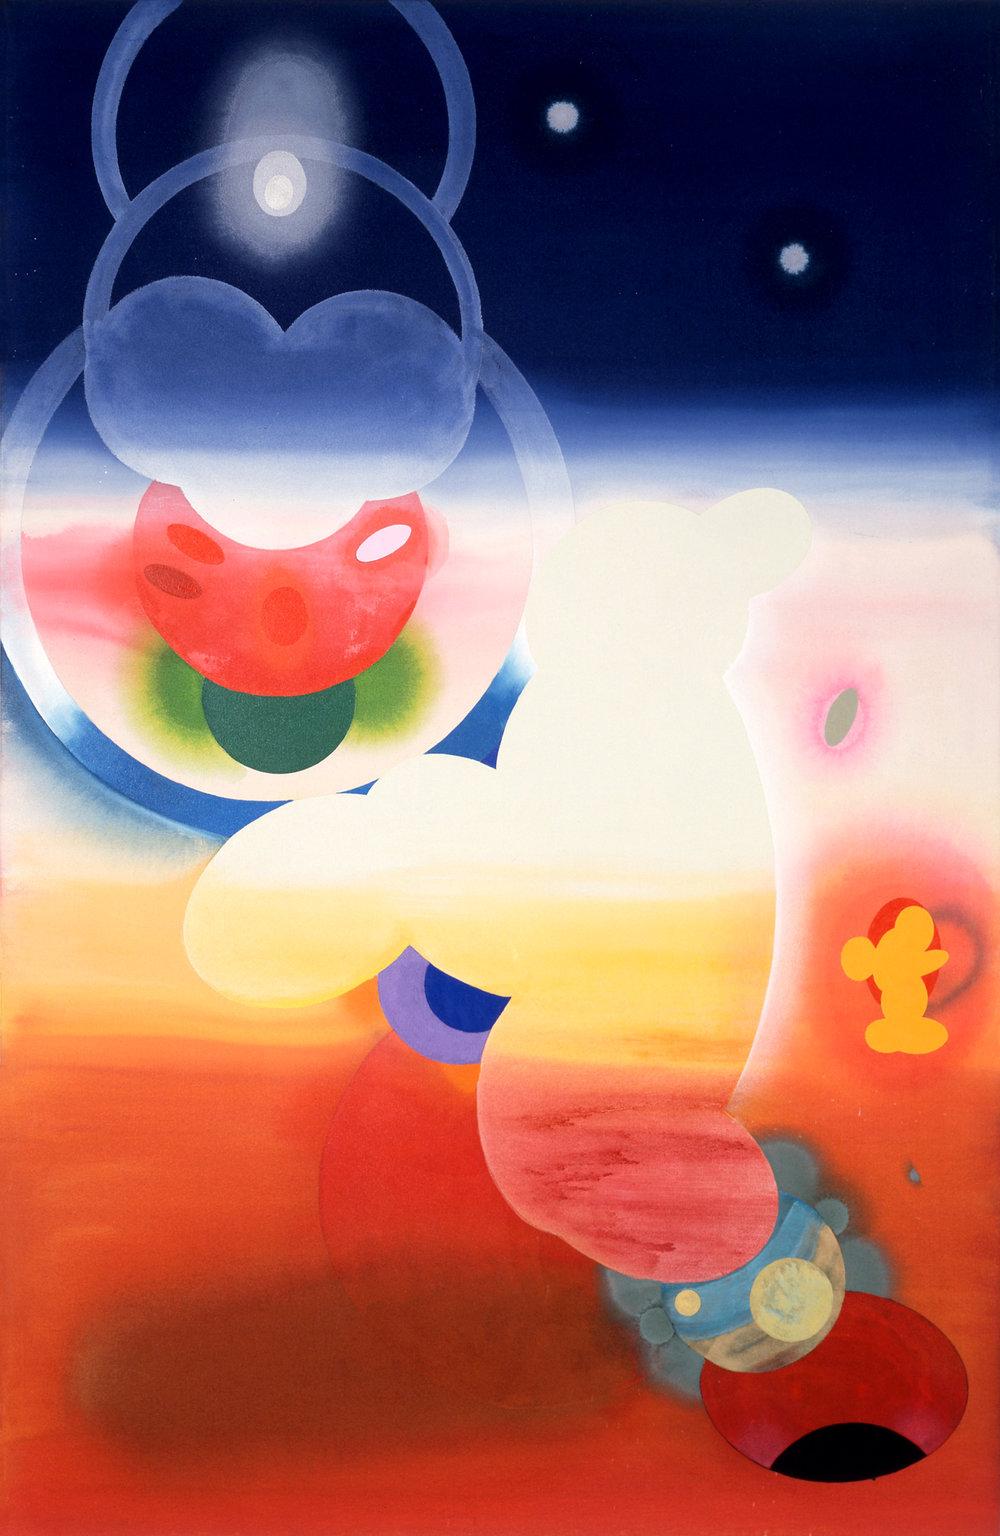 Stephen Mueller  Hey Tira Mi Su , 1995 Acrylic on canvas 92 × 60 inches Courtesy of Lennon, Weinberg, Inc., New York and Texas Gallery, Houston